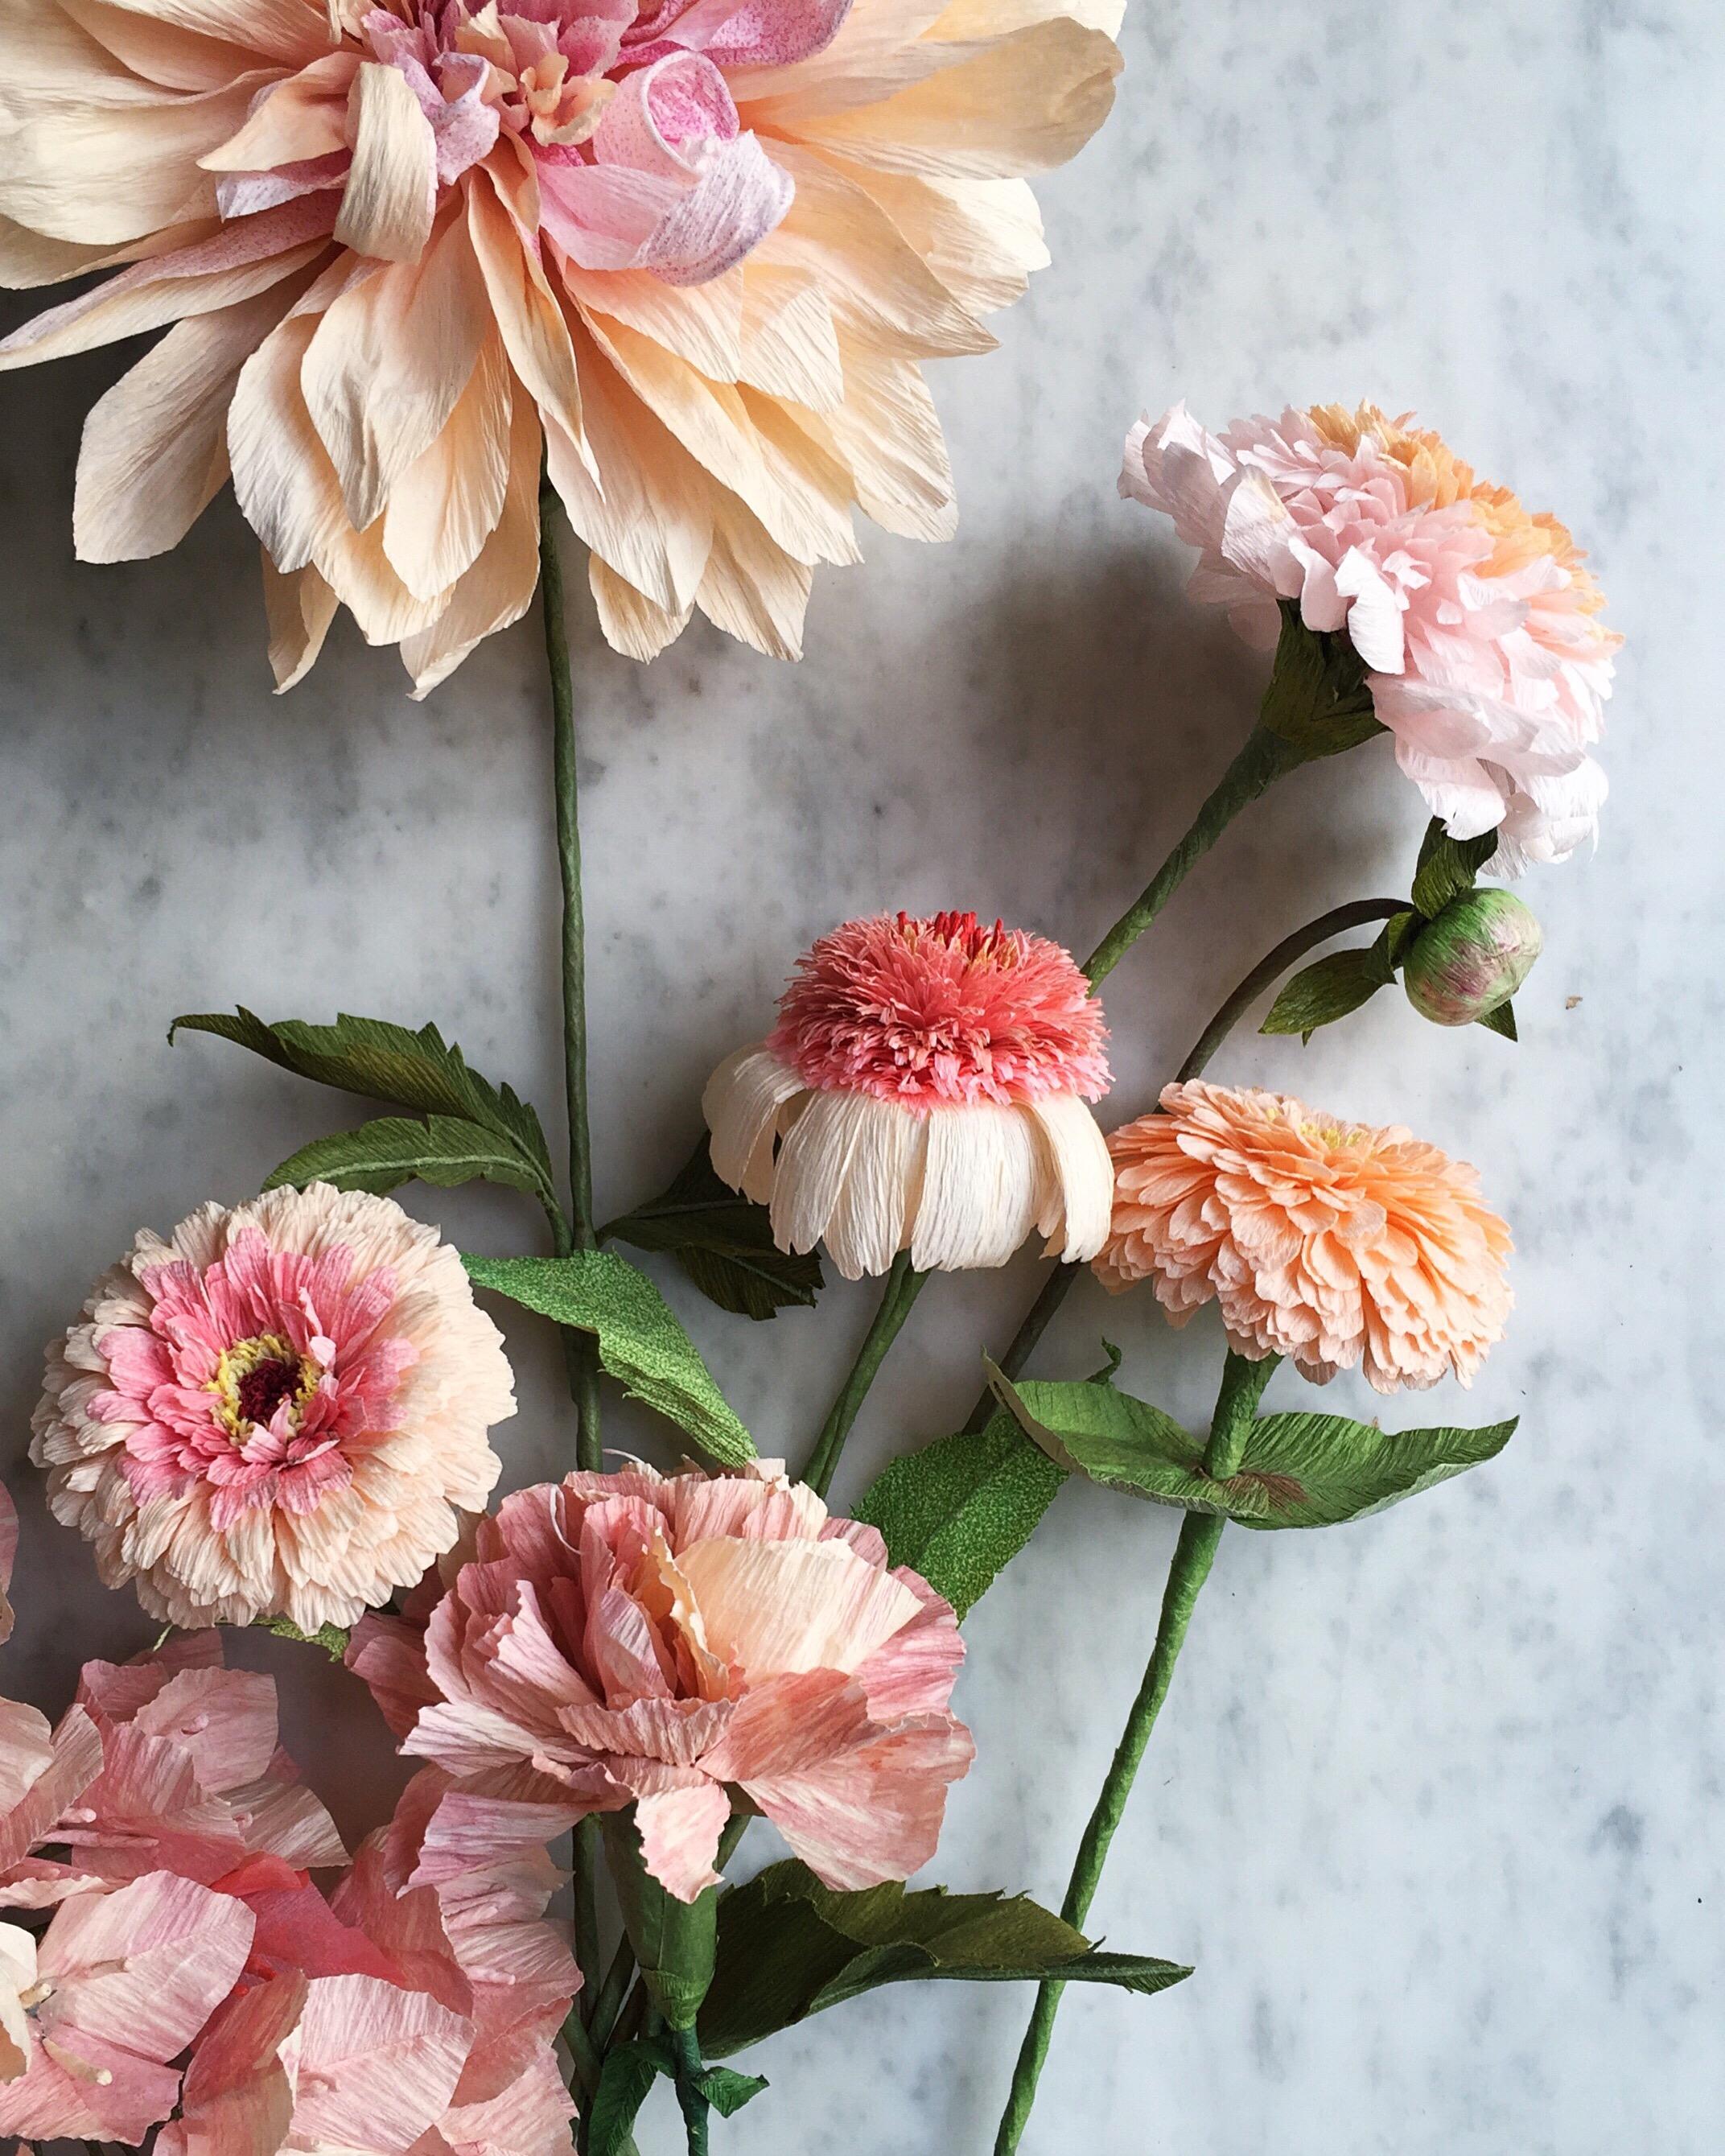 Dahlias, coneflowers and zinnias